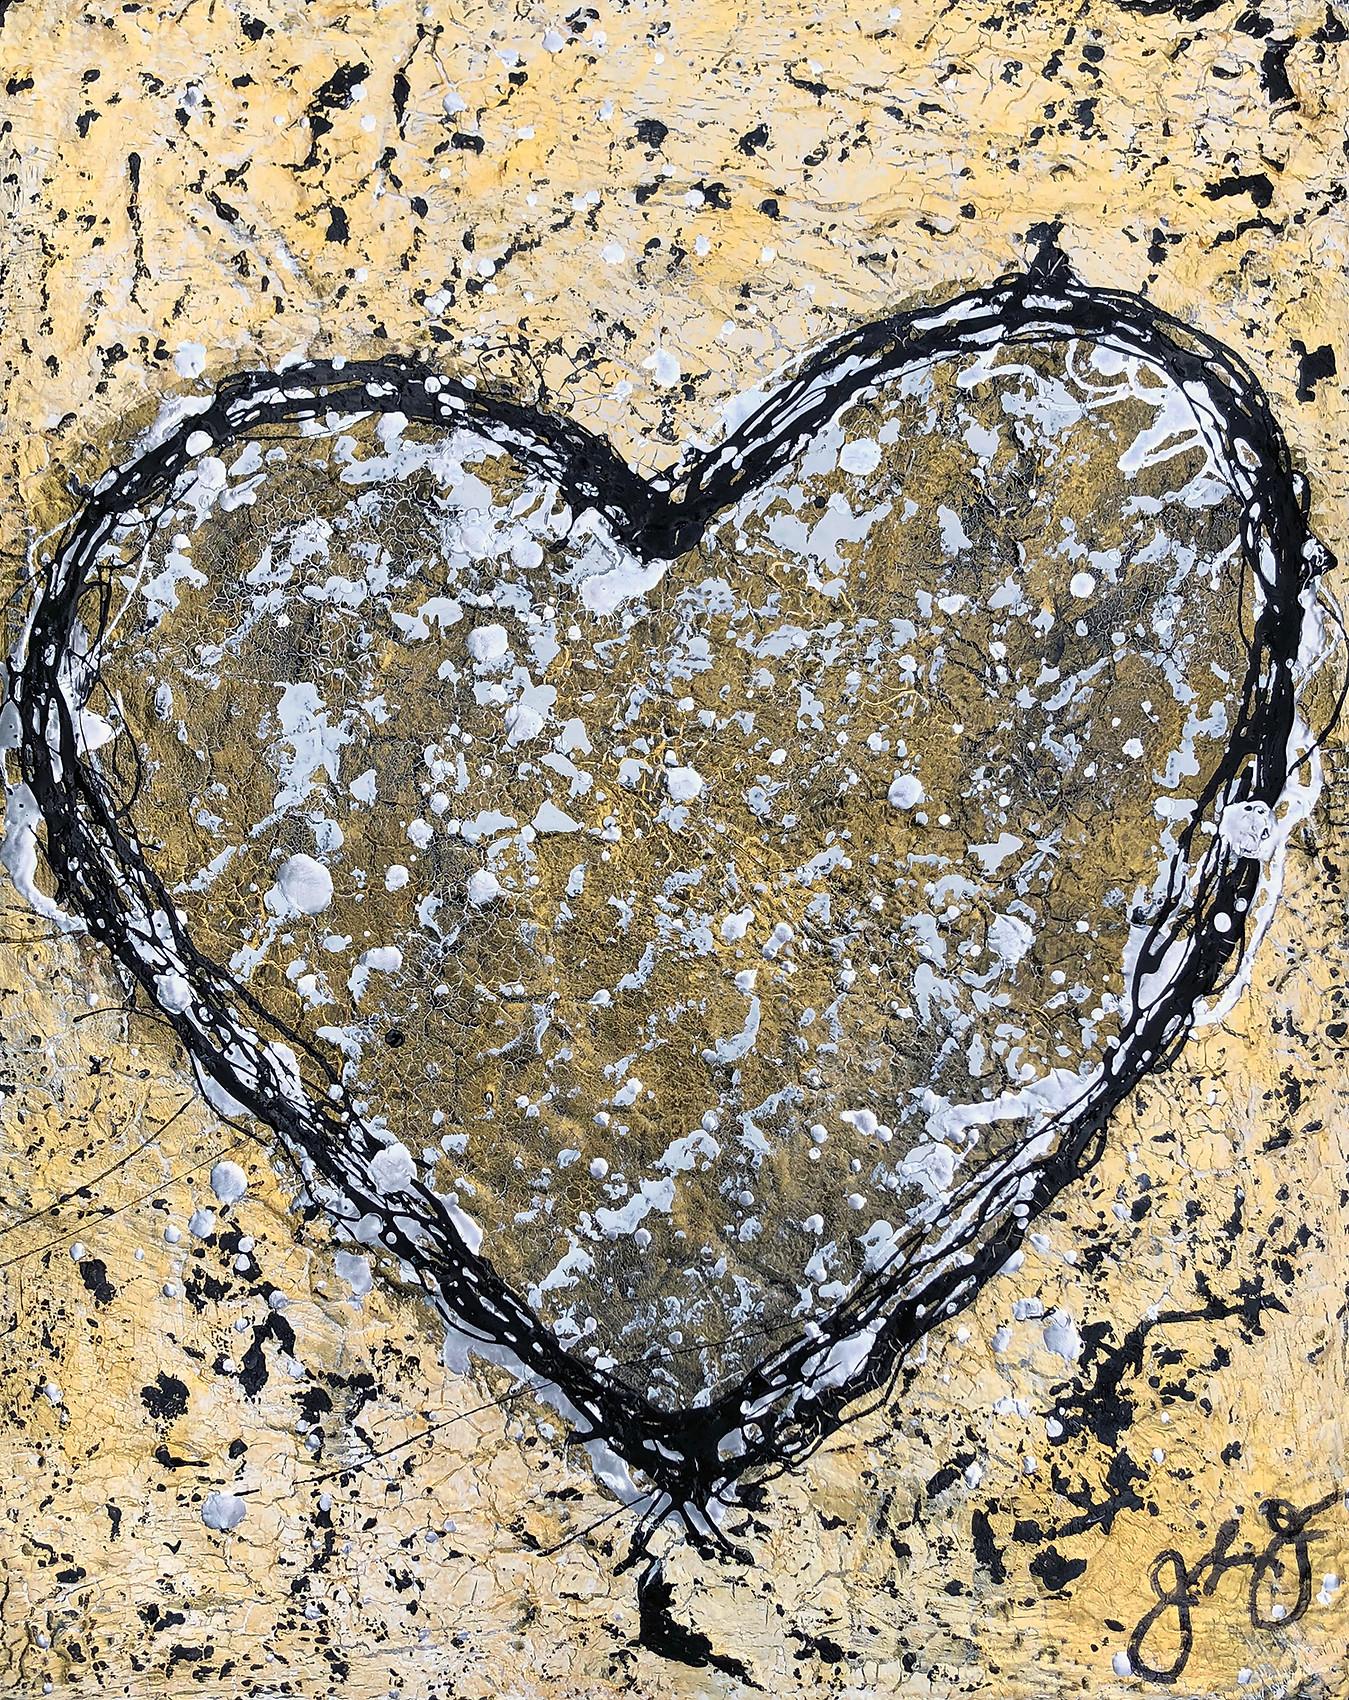 essen's heart 15.jpg